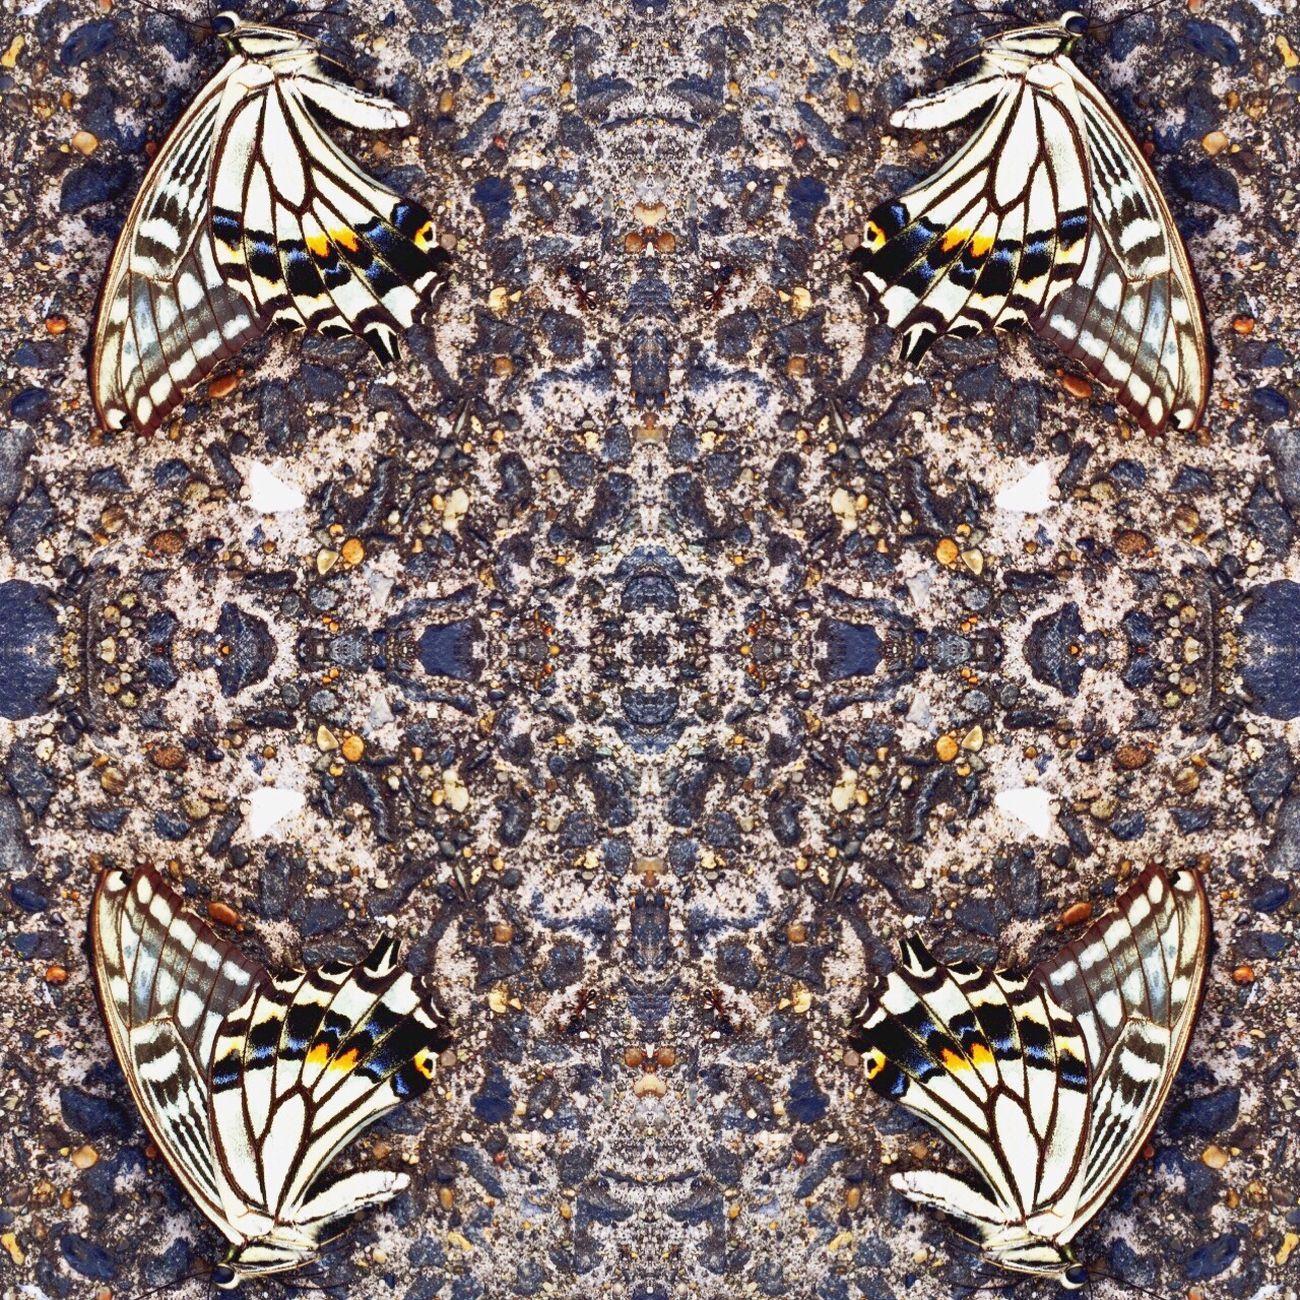 Butterfly Asfalto Ageha